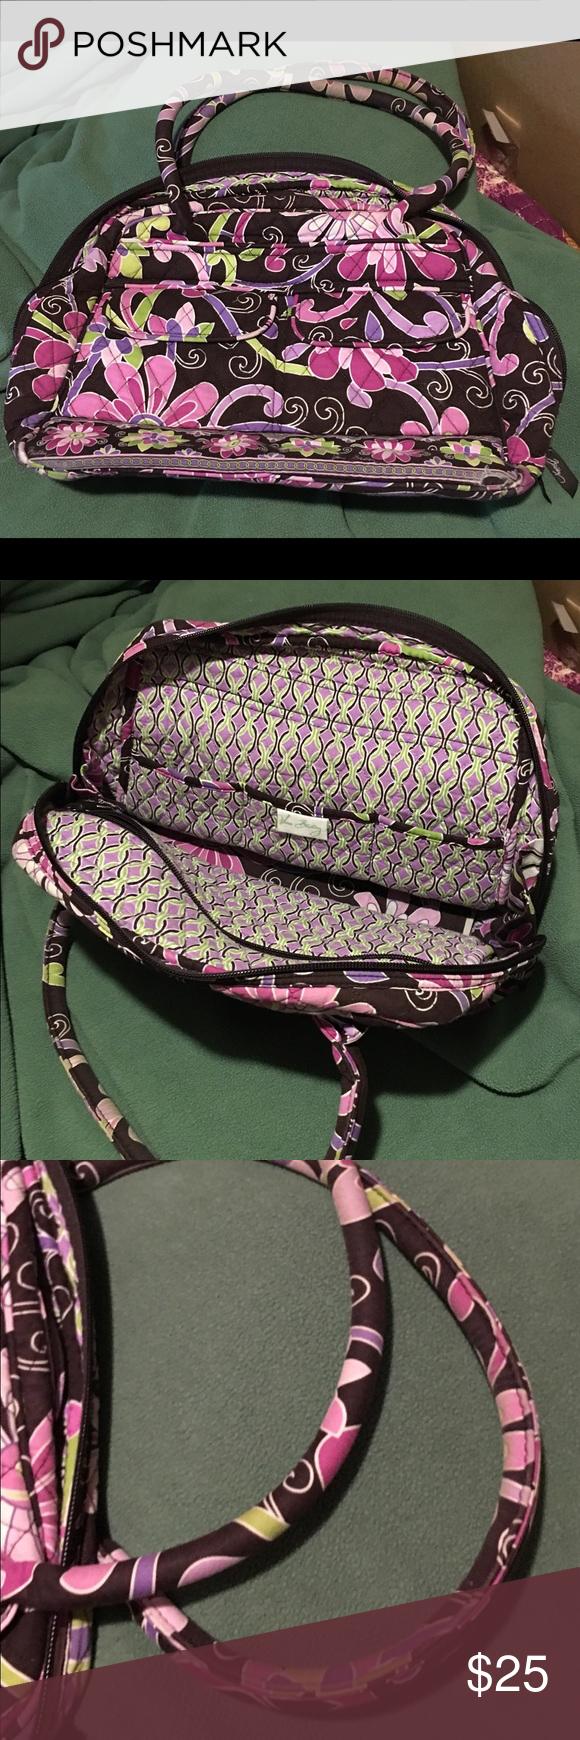 Vera Bradley Purple Punch Bowler Bag Great used bag, still has plenty of  life left c699150433